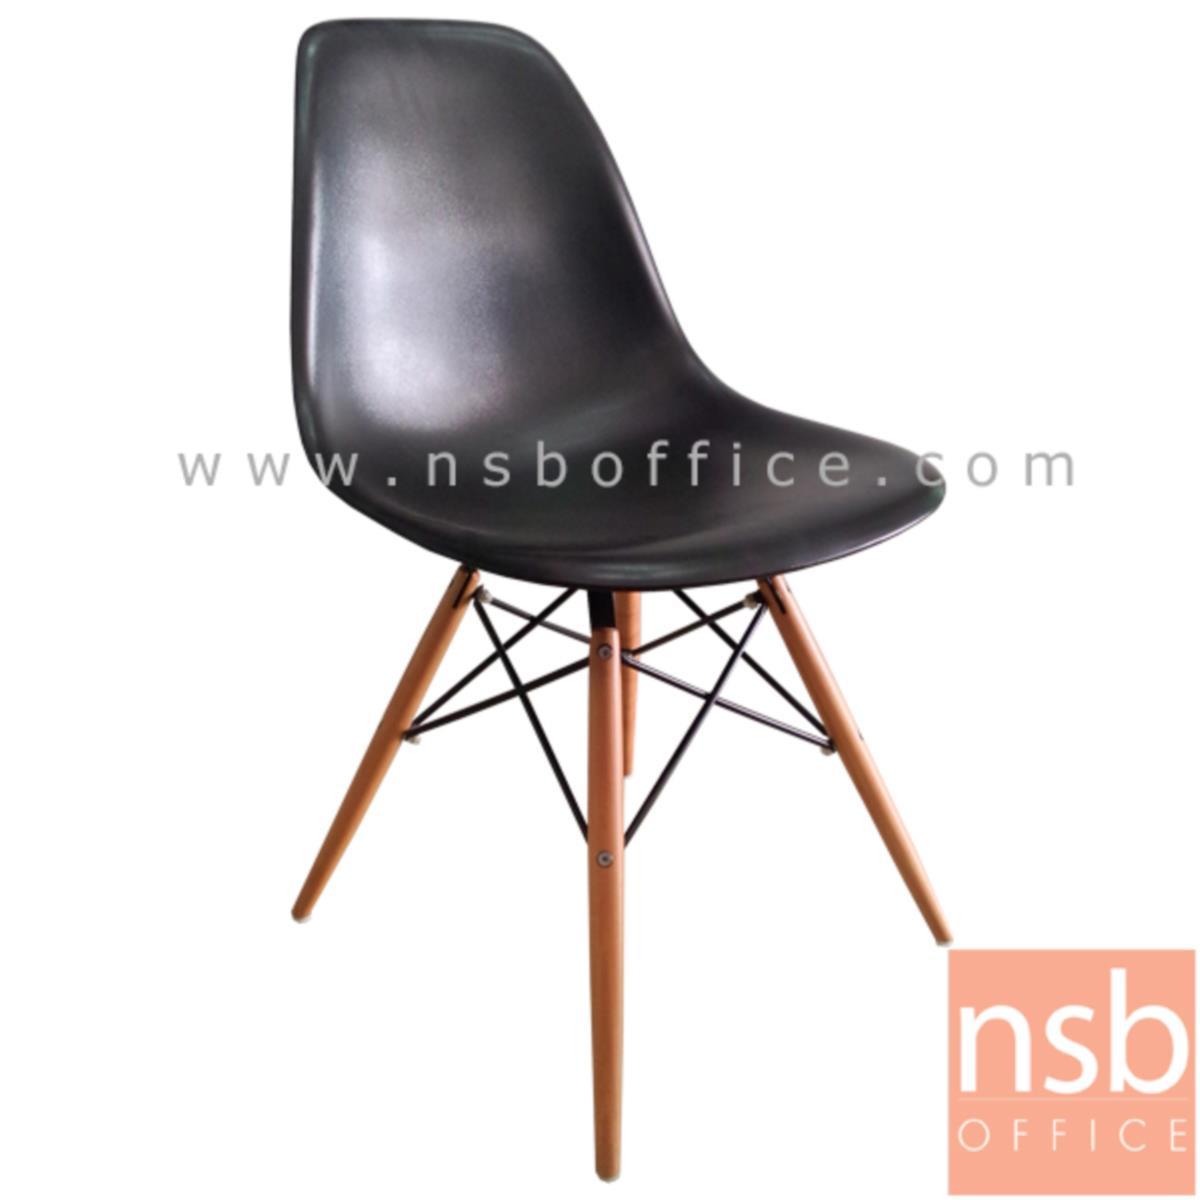 B05A088:เก้าอี้โมเดิร์นพลาสติก (ABS) รุ่น Carlyle (คาร์ไลล์) ขนาด 46W cm. โครงเหล็กเส้นพ่นดำ ขาไม้สีบีช